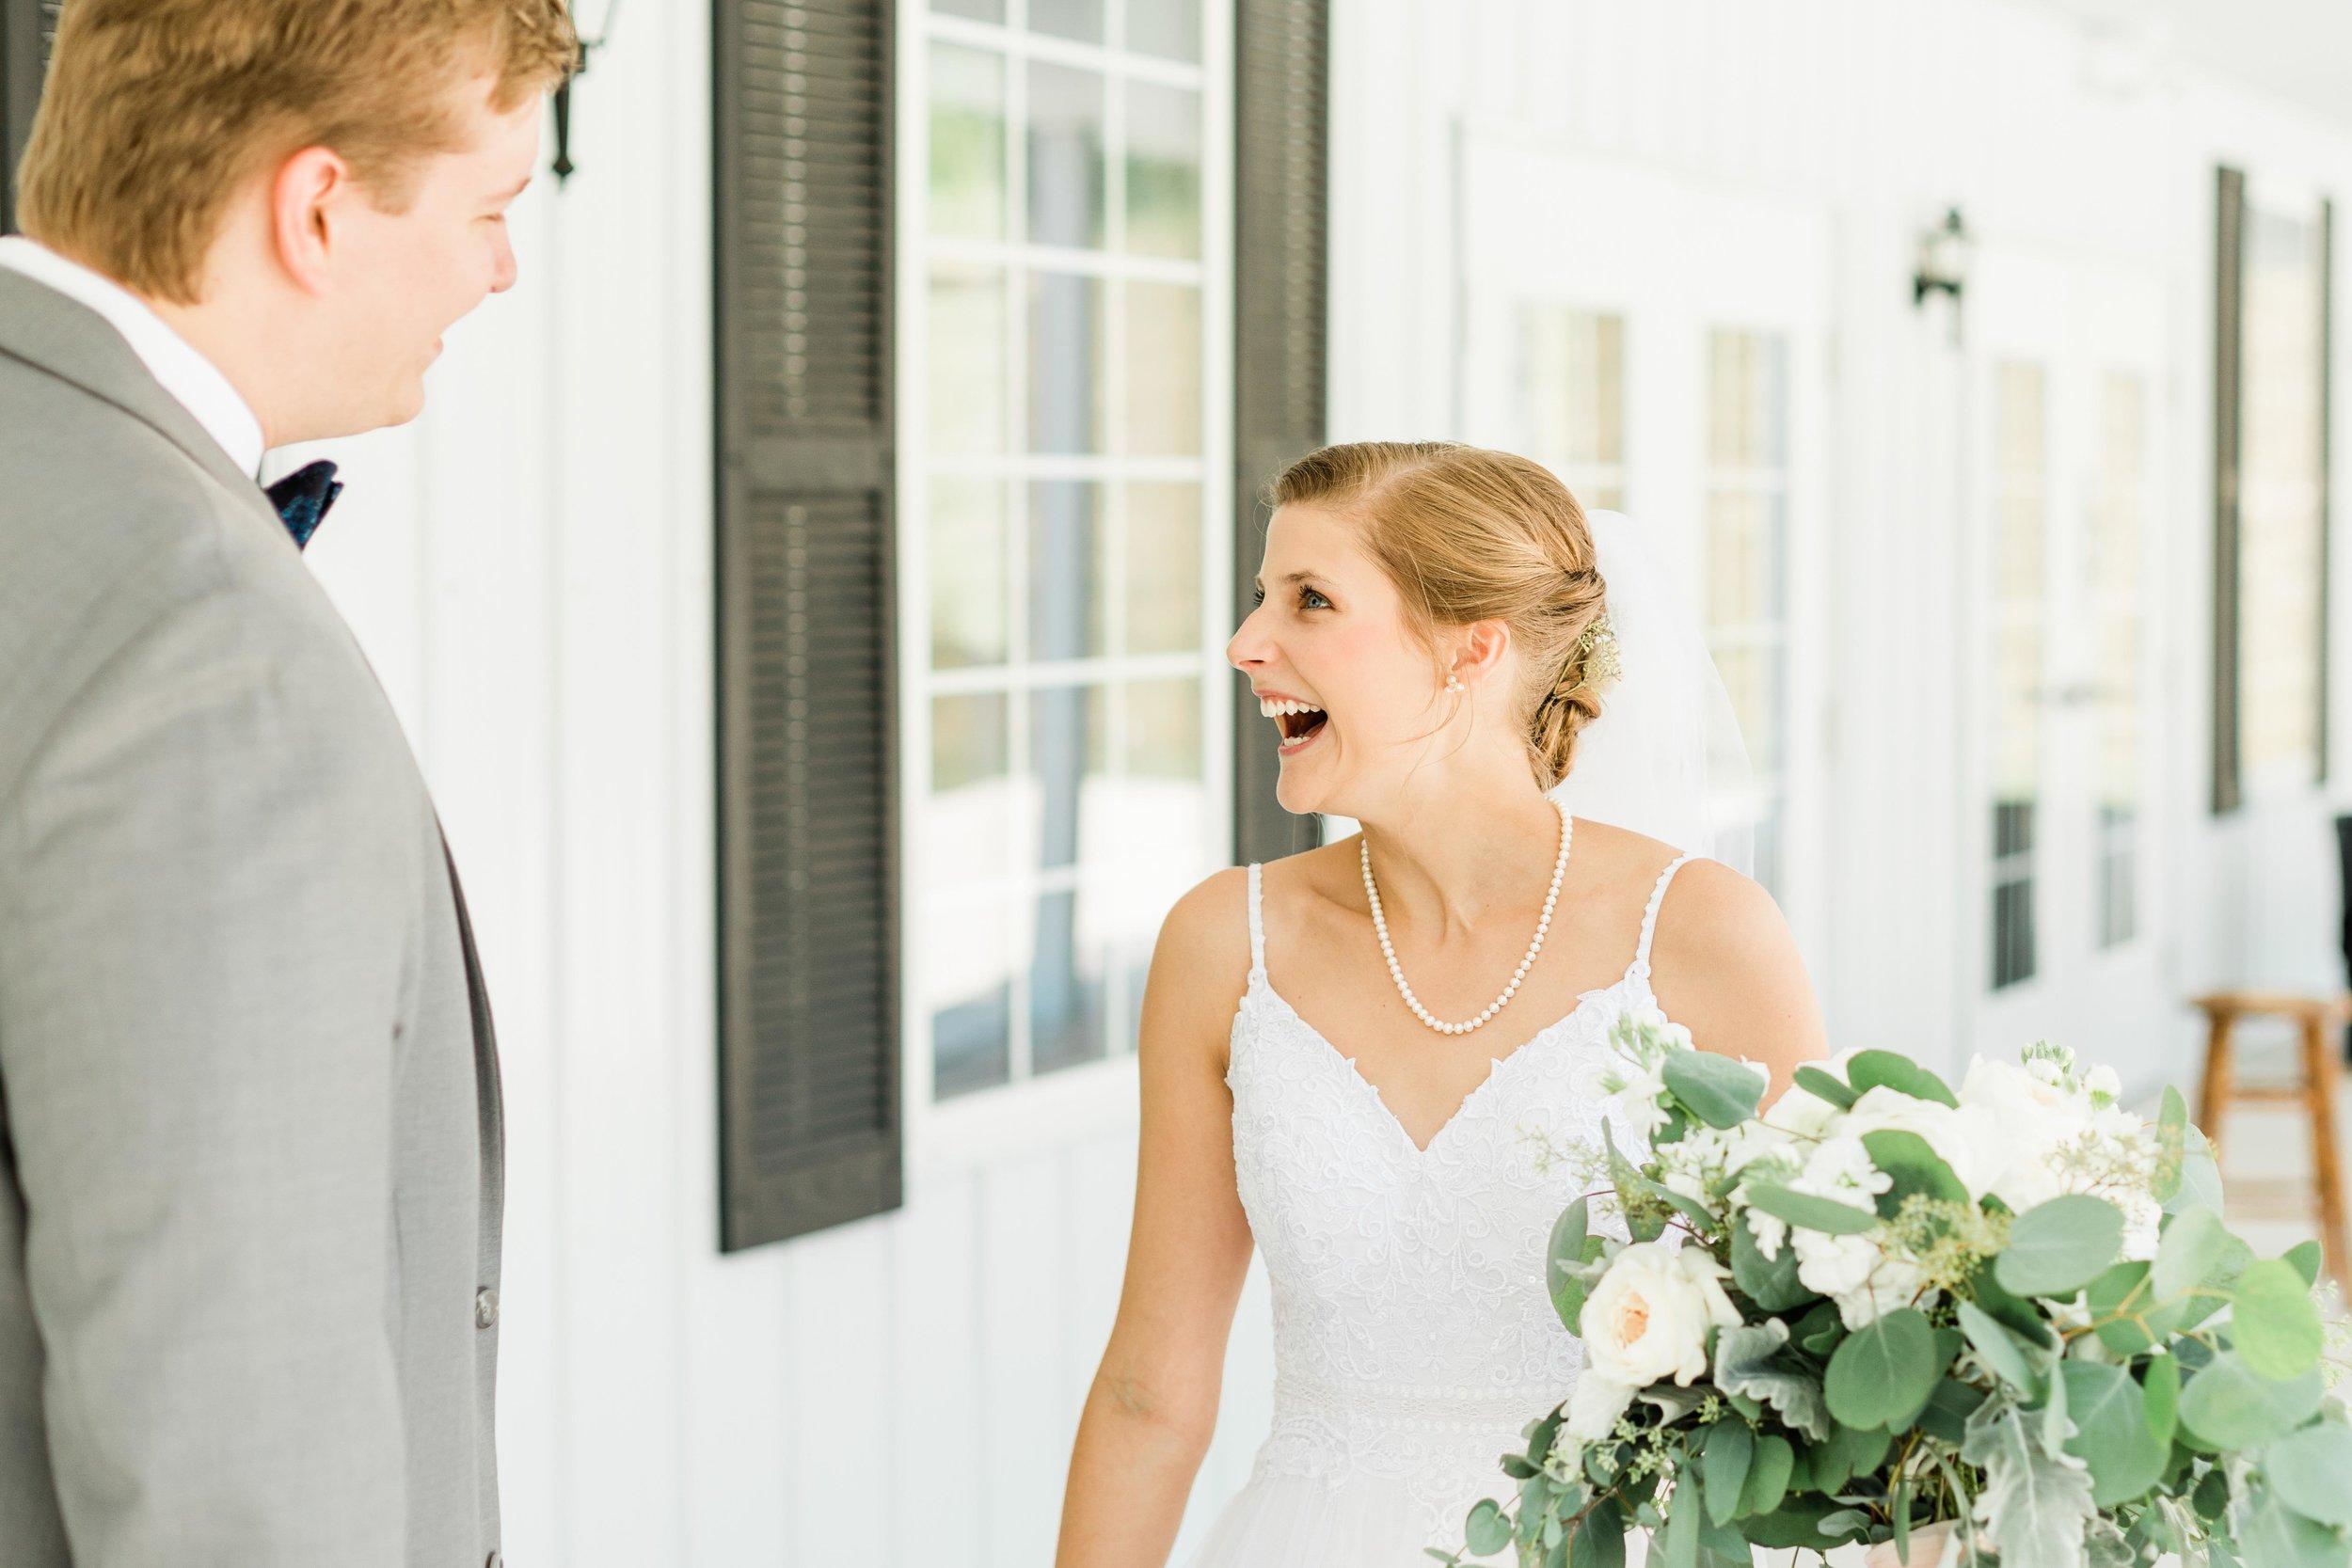 rosewood manor miamisburg ohio wedding-1.jpg